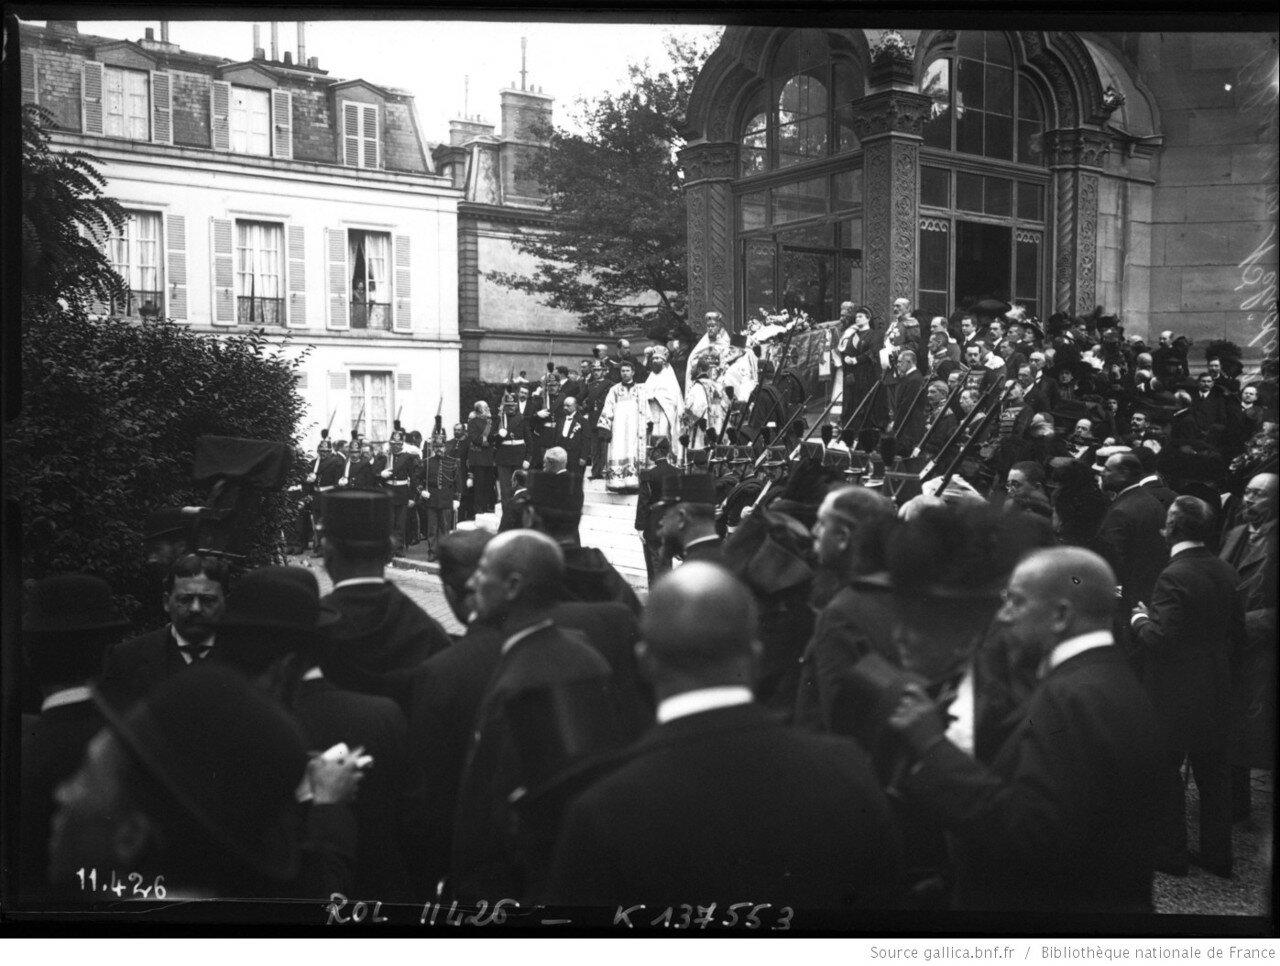 1910. 20 �������� 1910. �������� ���������� ��������� ��������, ����� ������ �� �������. ����� ����� ������� �������� �� �� ����